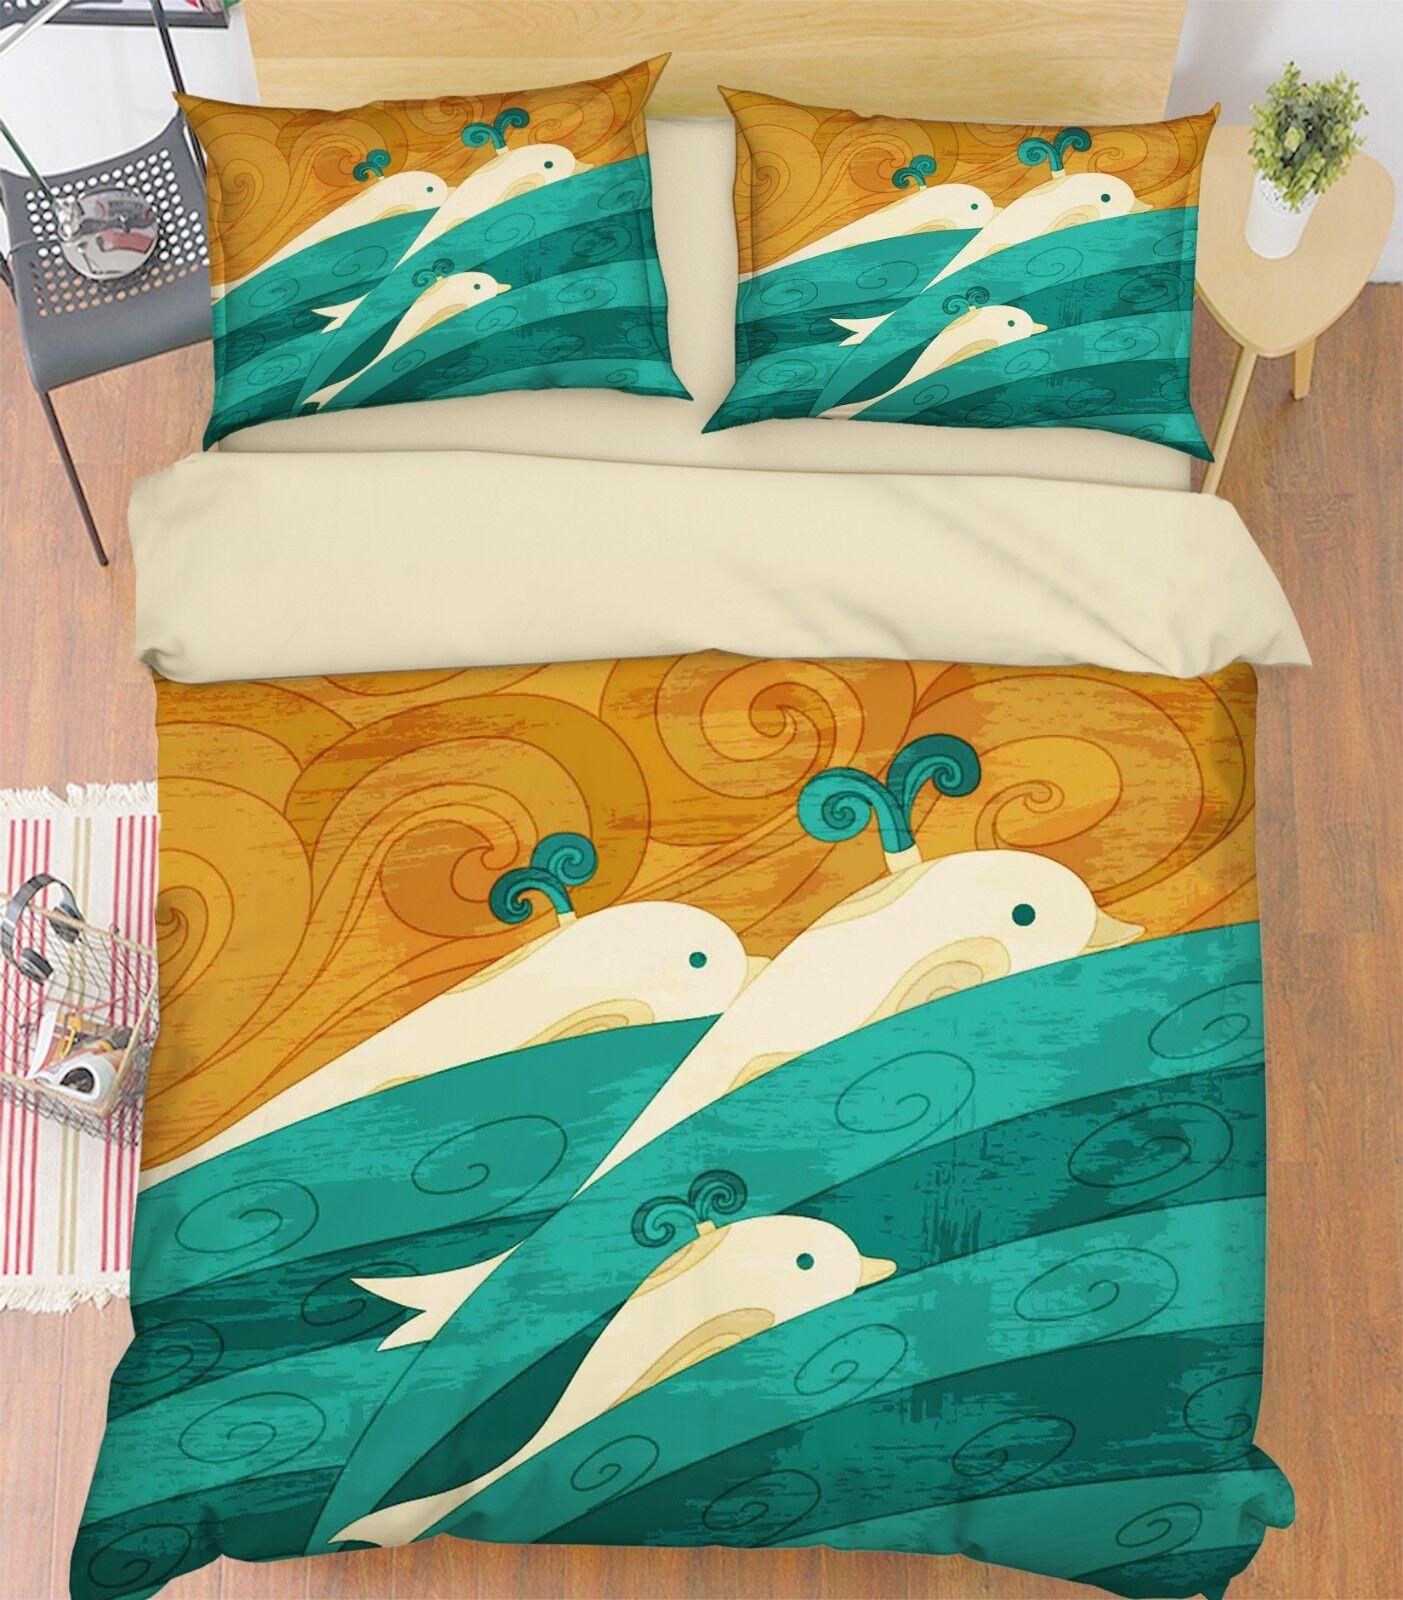 3D voituretoon Whale 809 Bed PilFaiblecases Quilt Duvet Cover Set Single Queen King CA